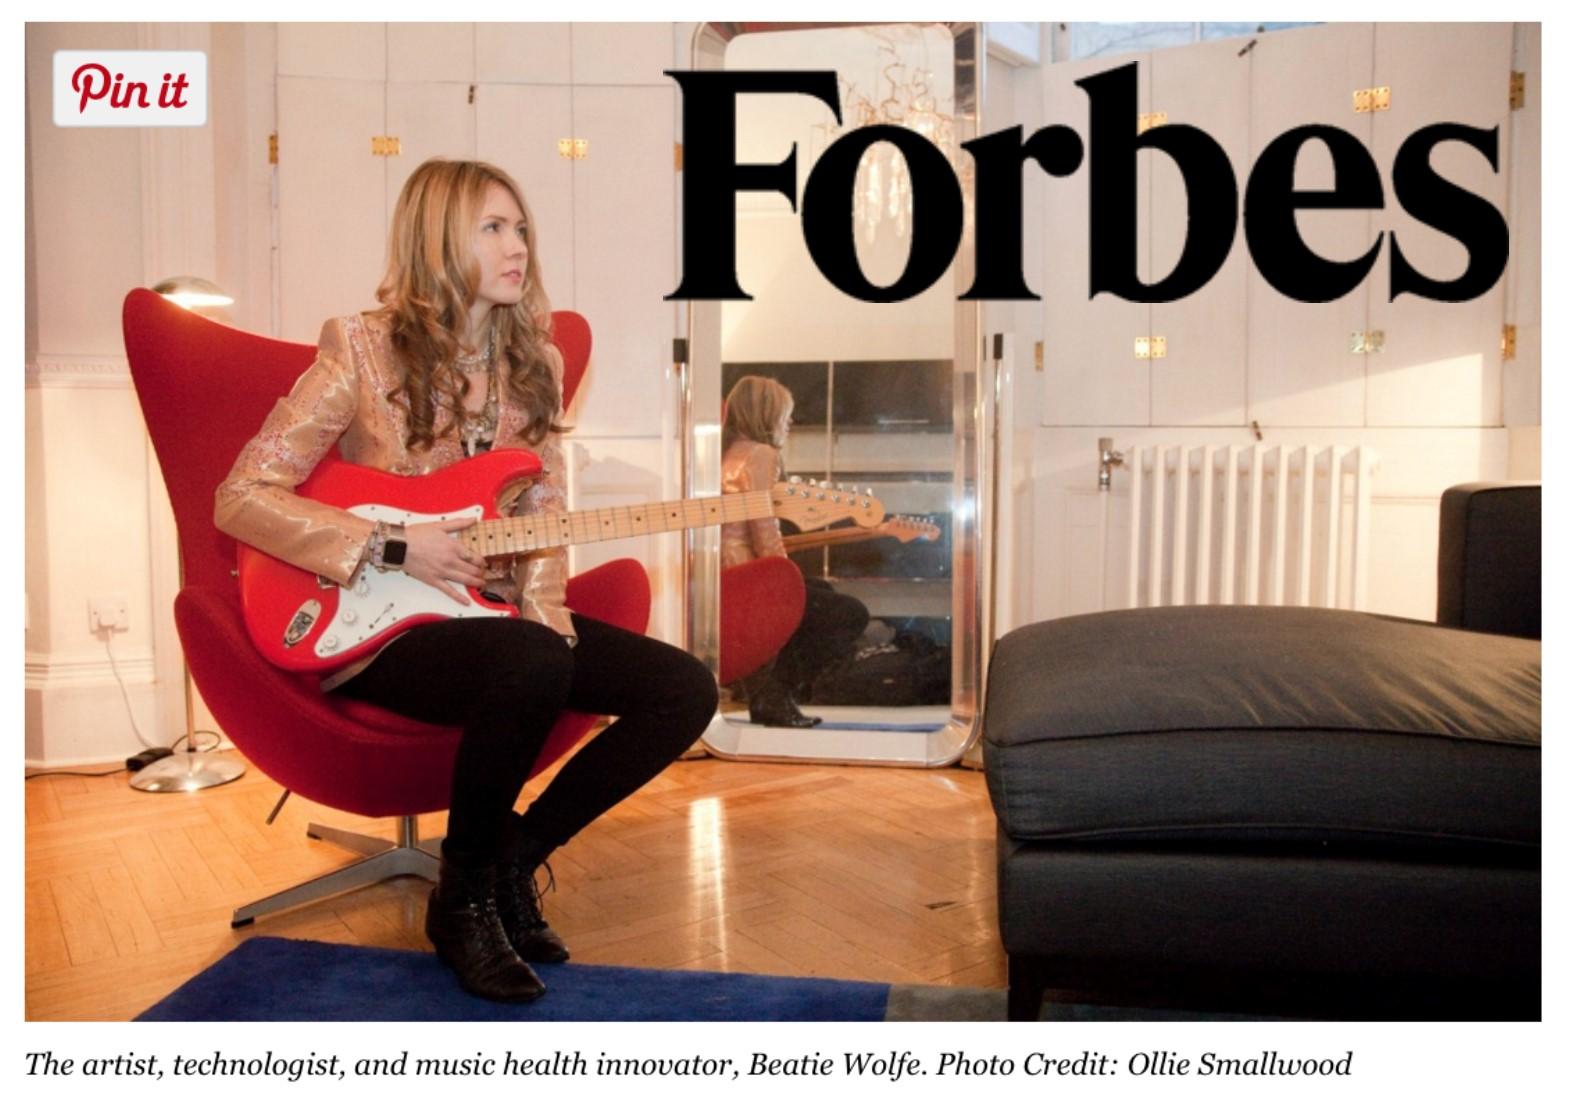 Beatie Wolfe in Forbes